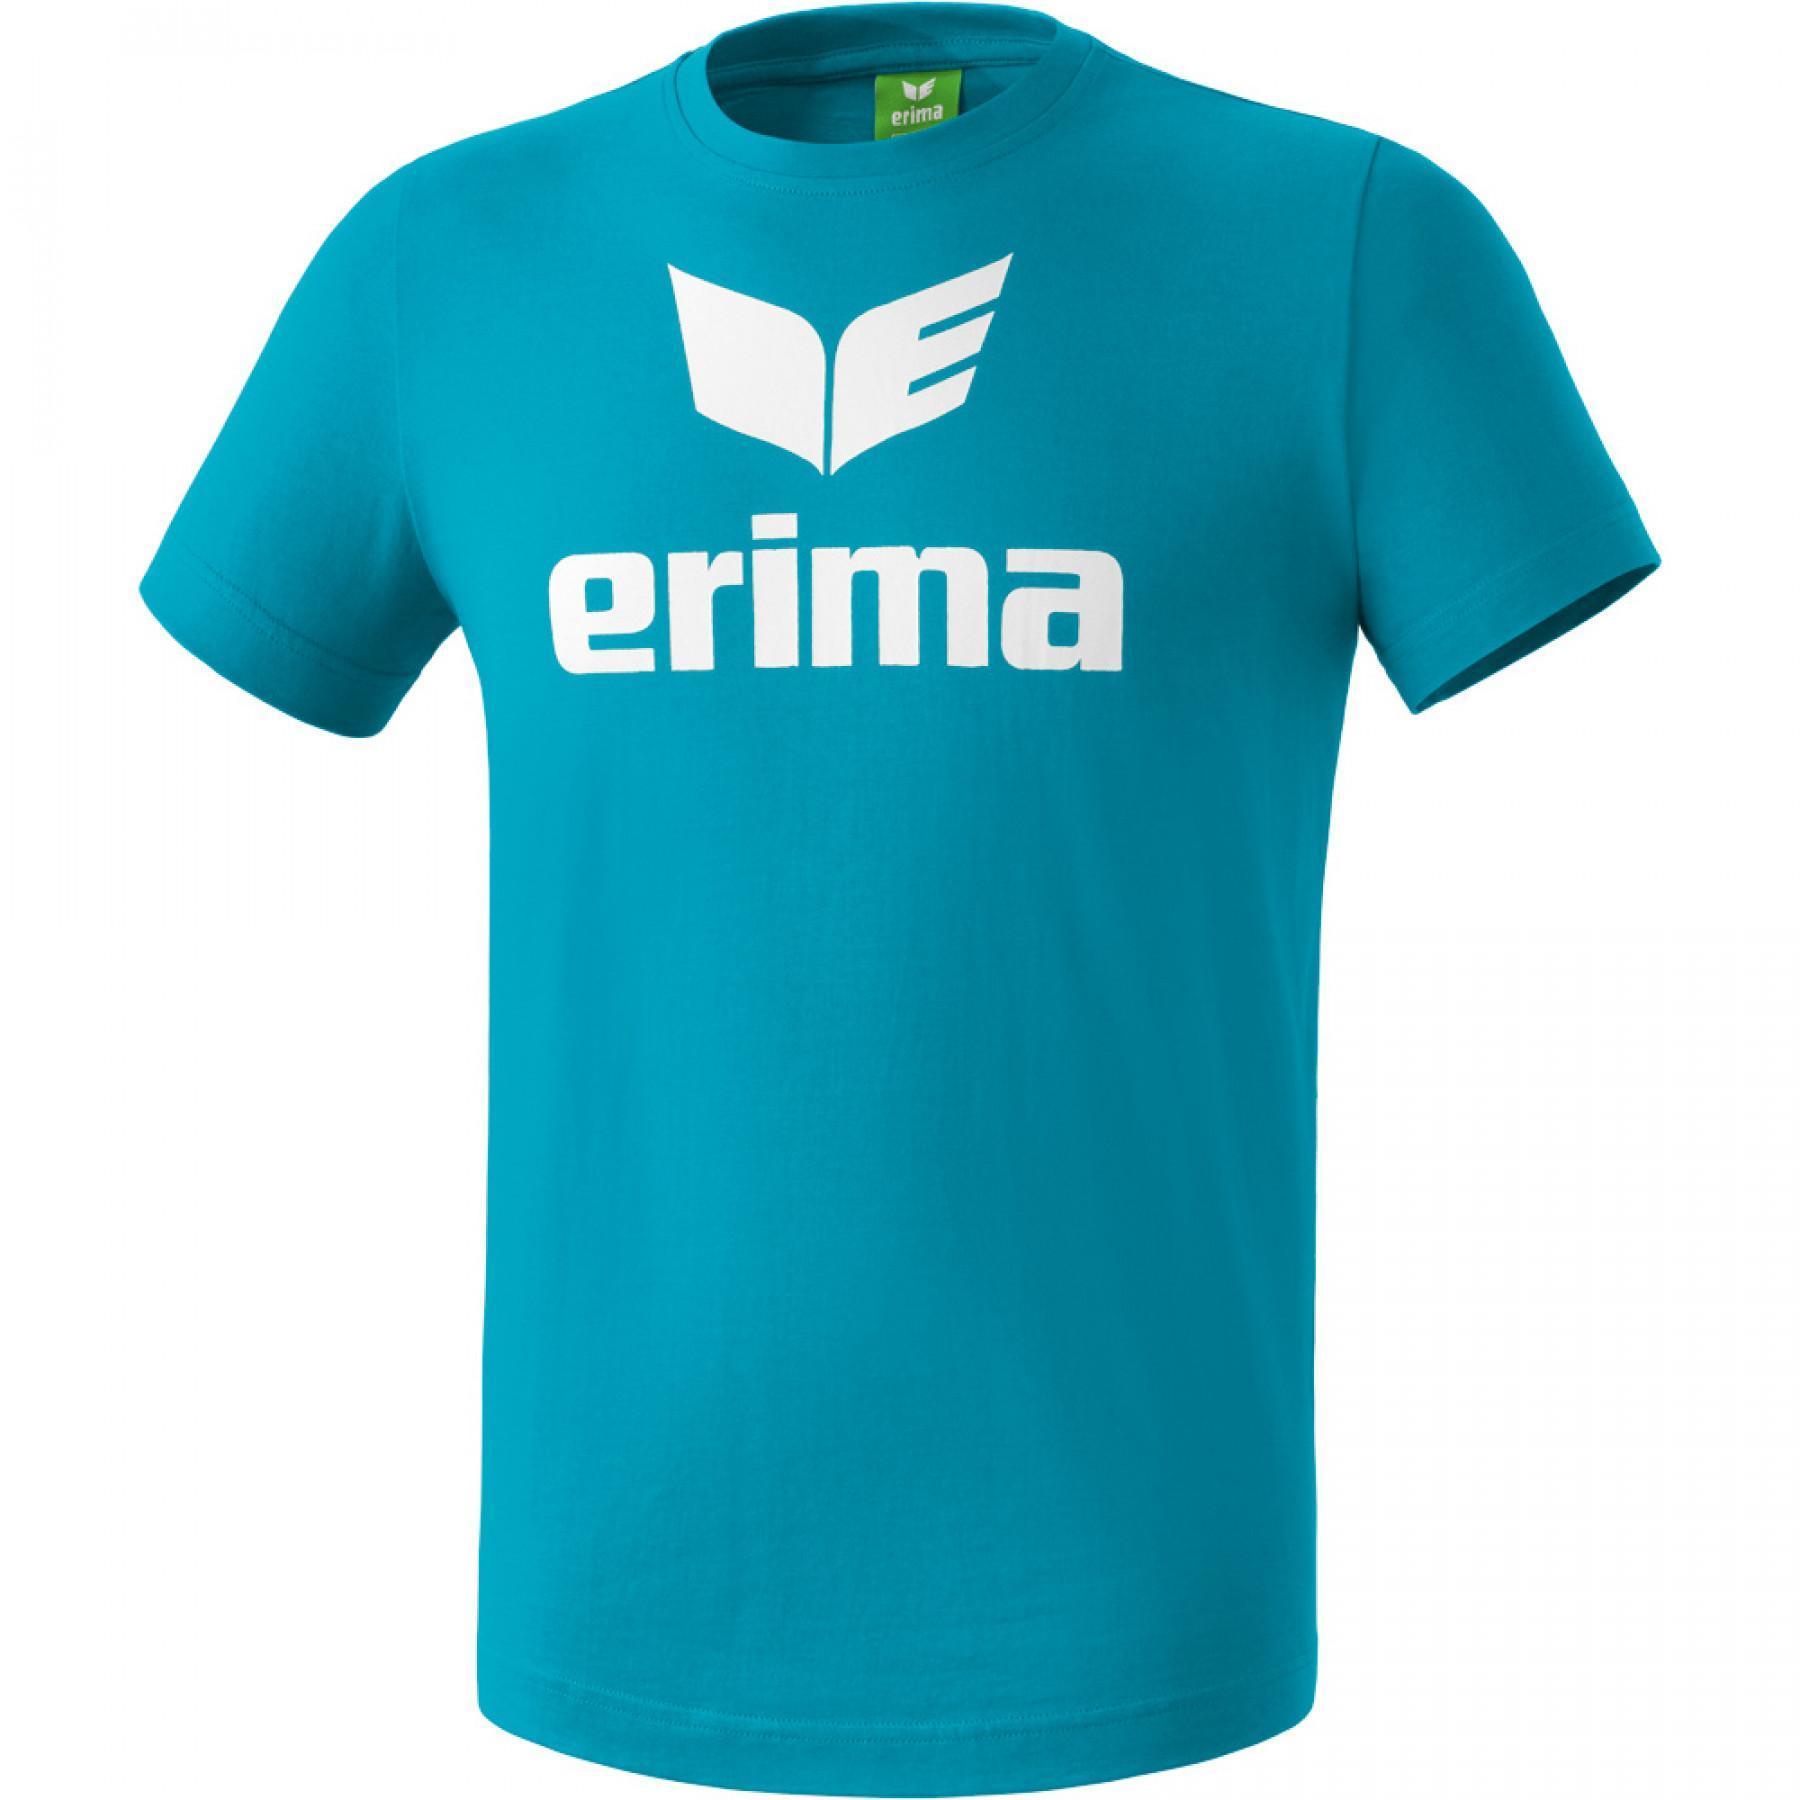 T-shirt Erima promo